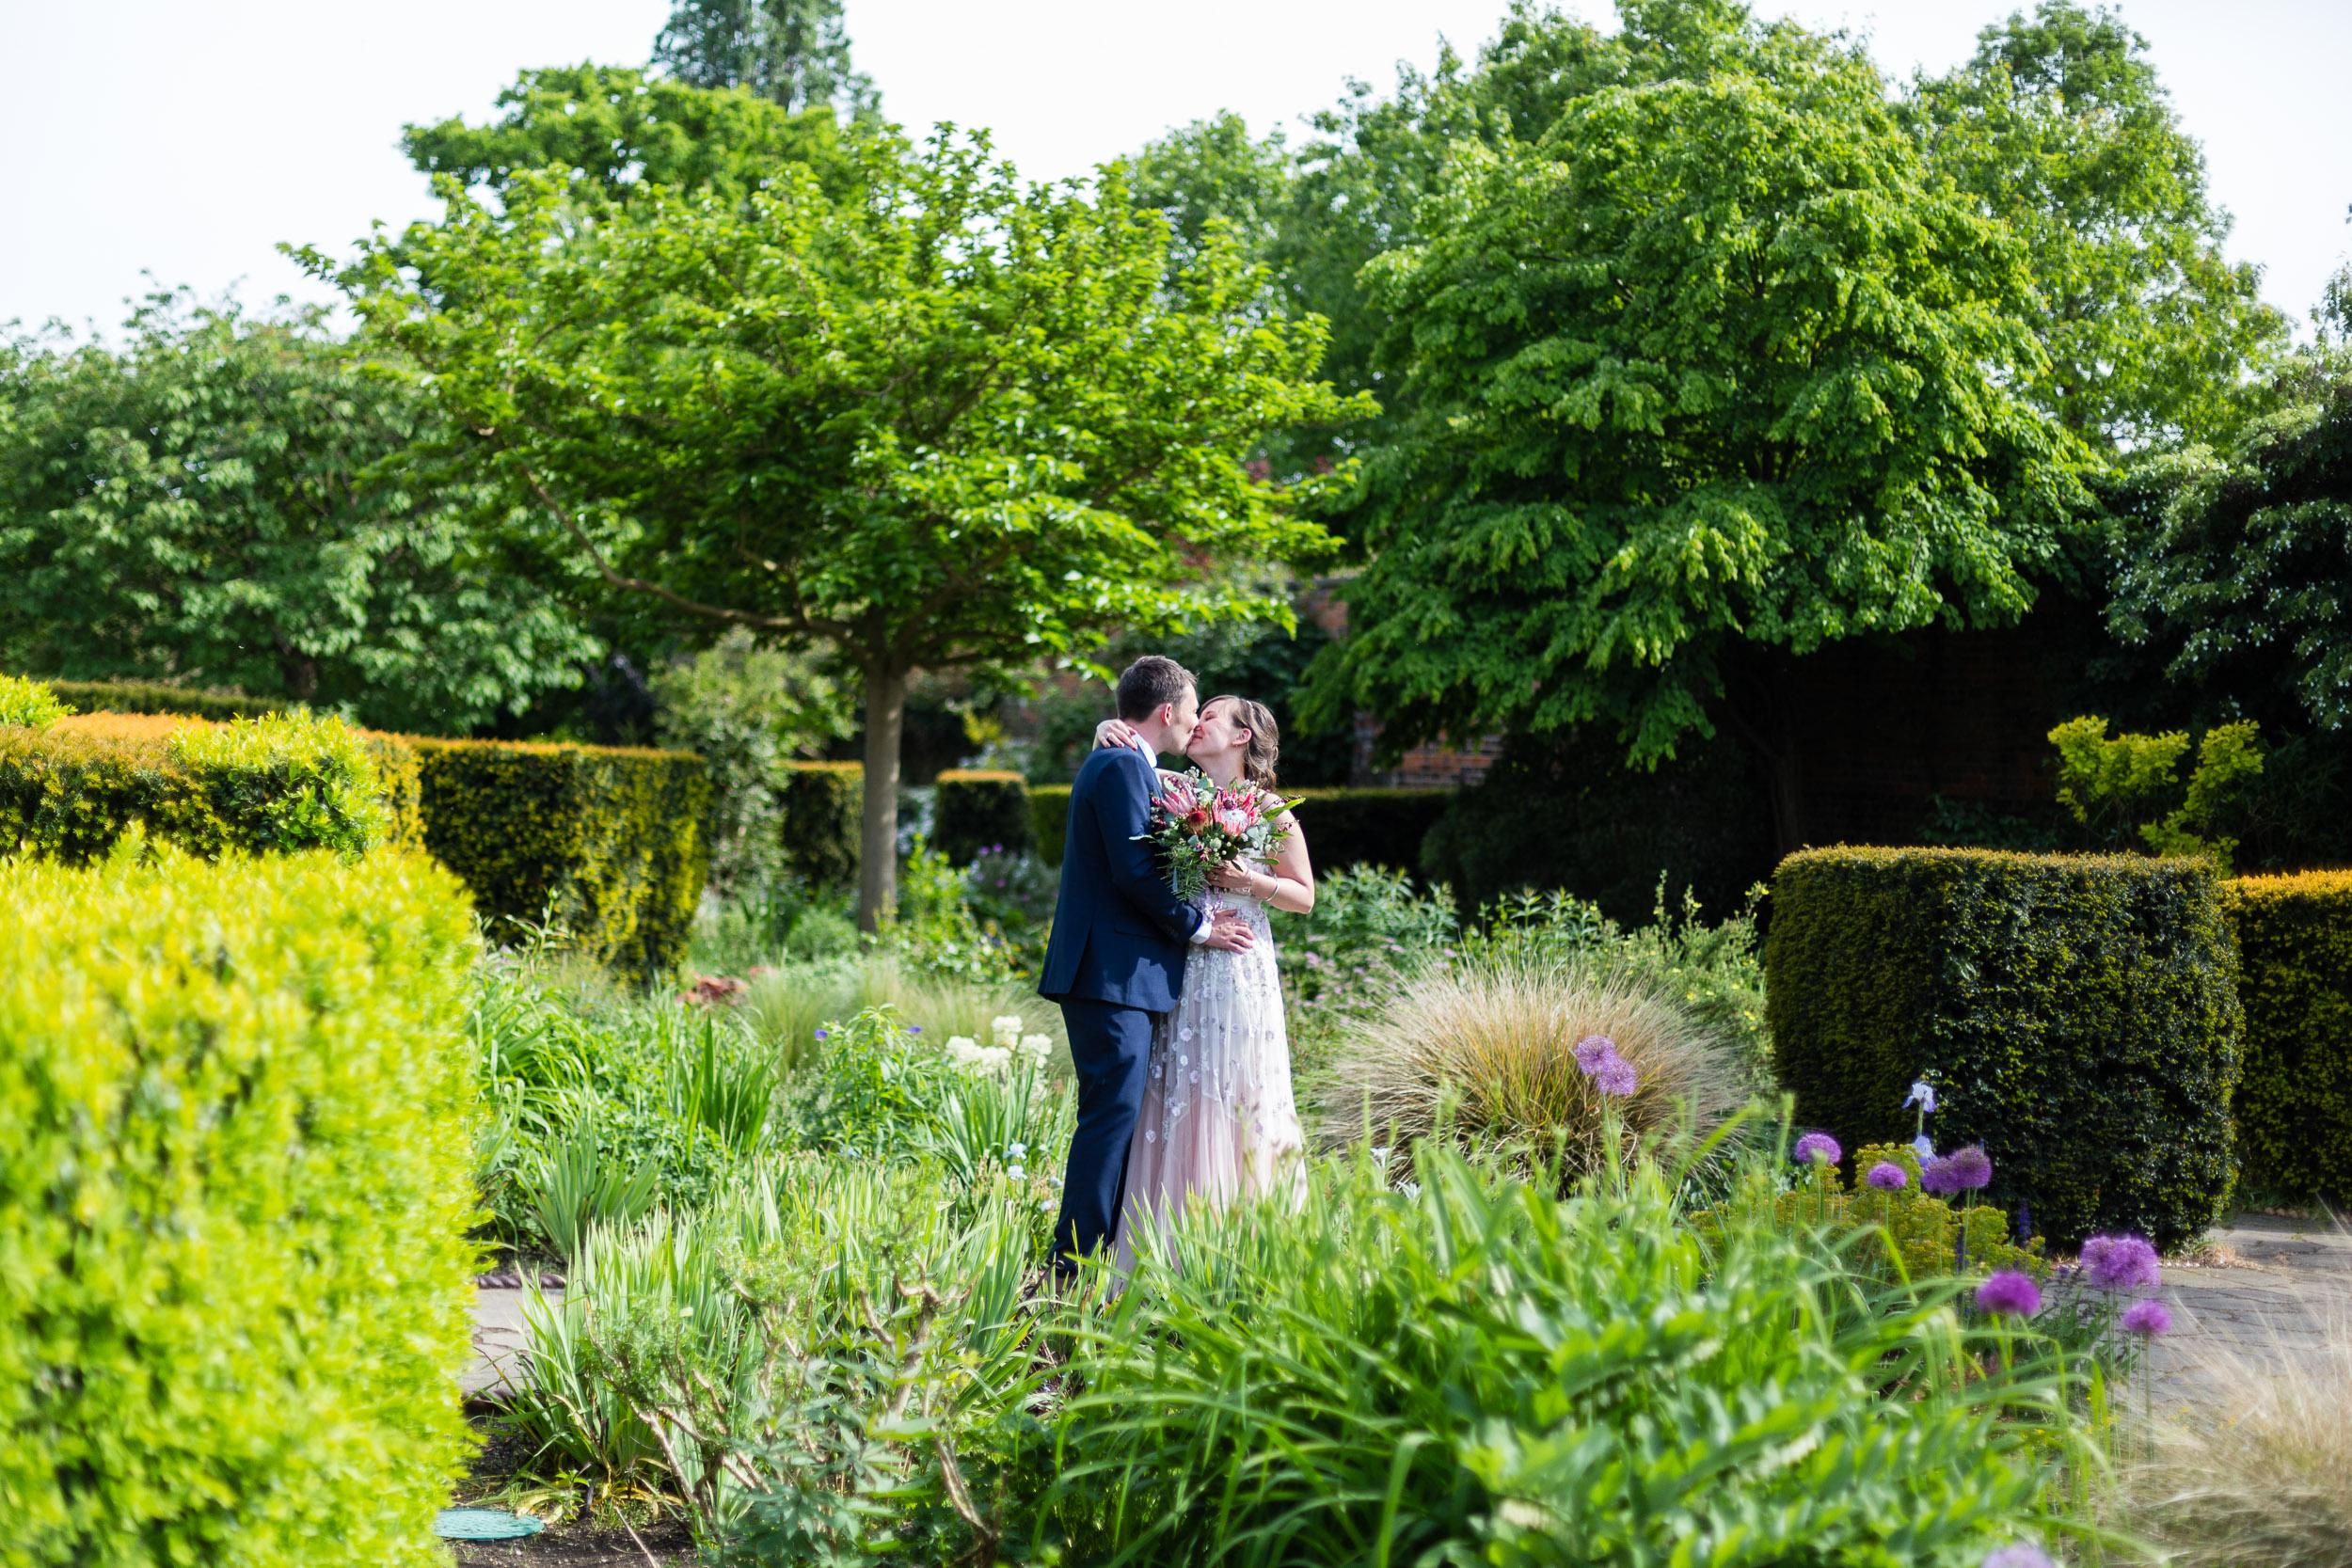 brockwell-lido-brixton-herne-hill-wedding-279.jpg